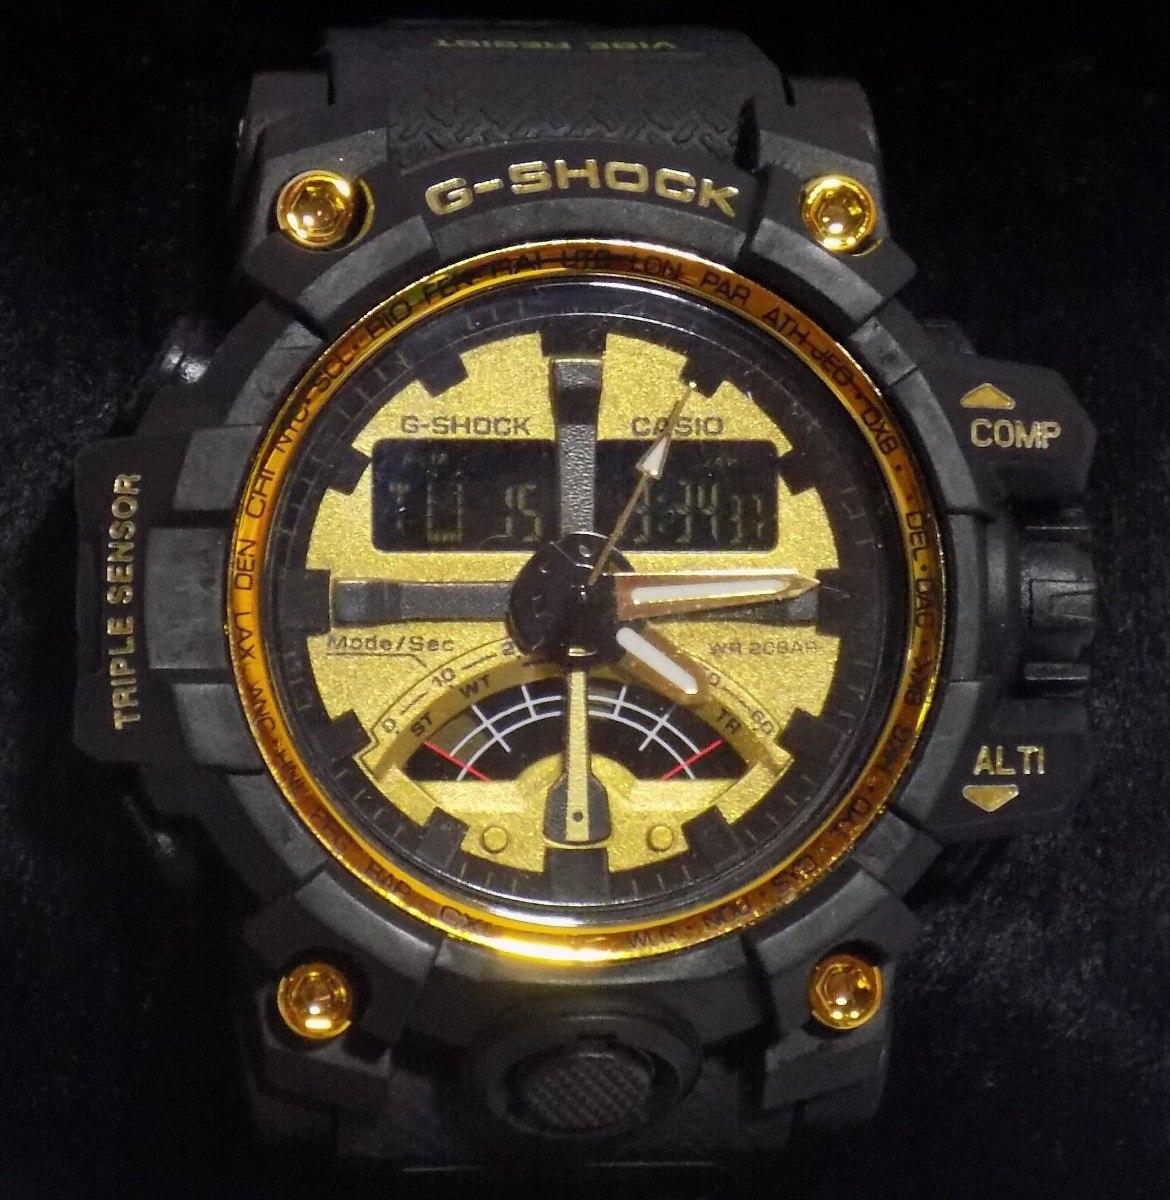 9827f2295b0 relógio masculino importado g shock barato resistente a água. Carregando  zoom.